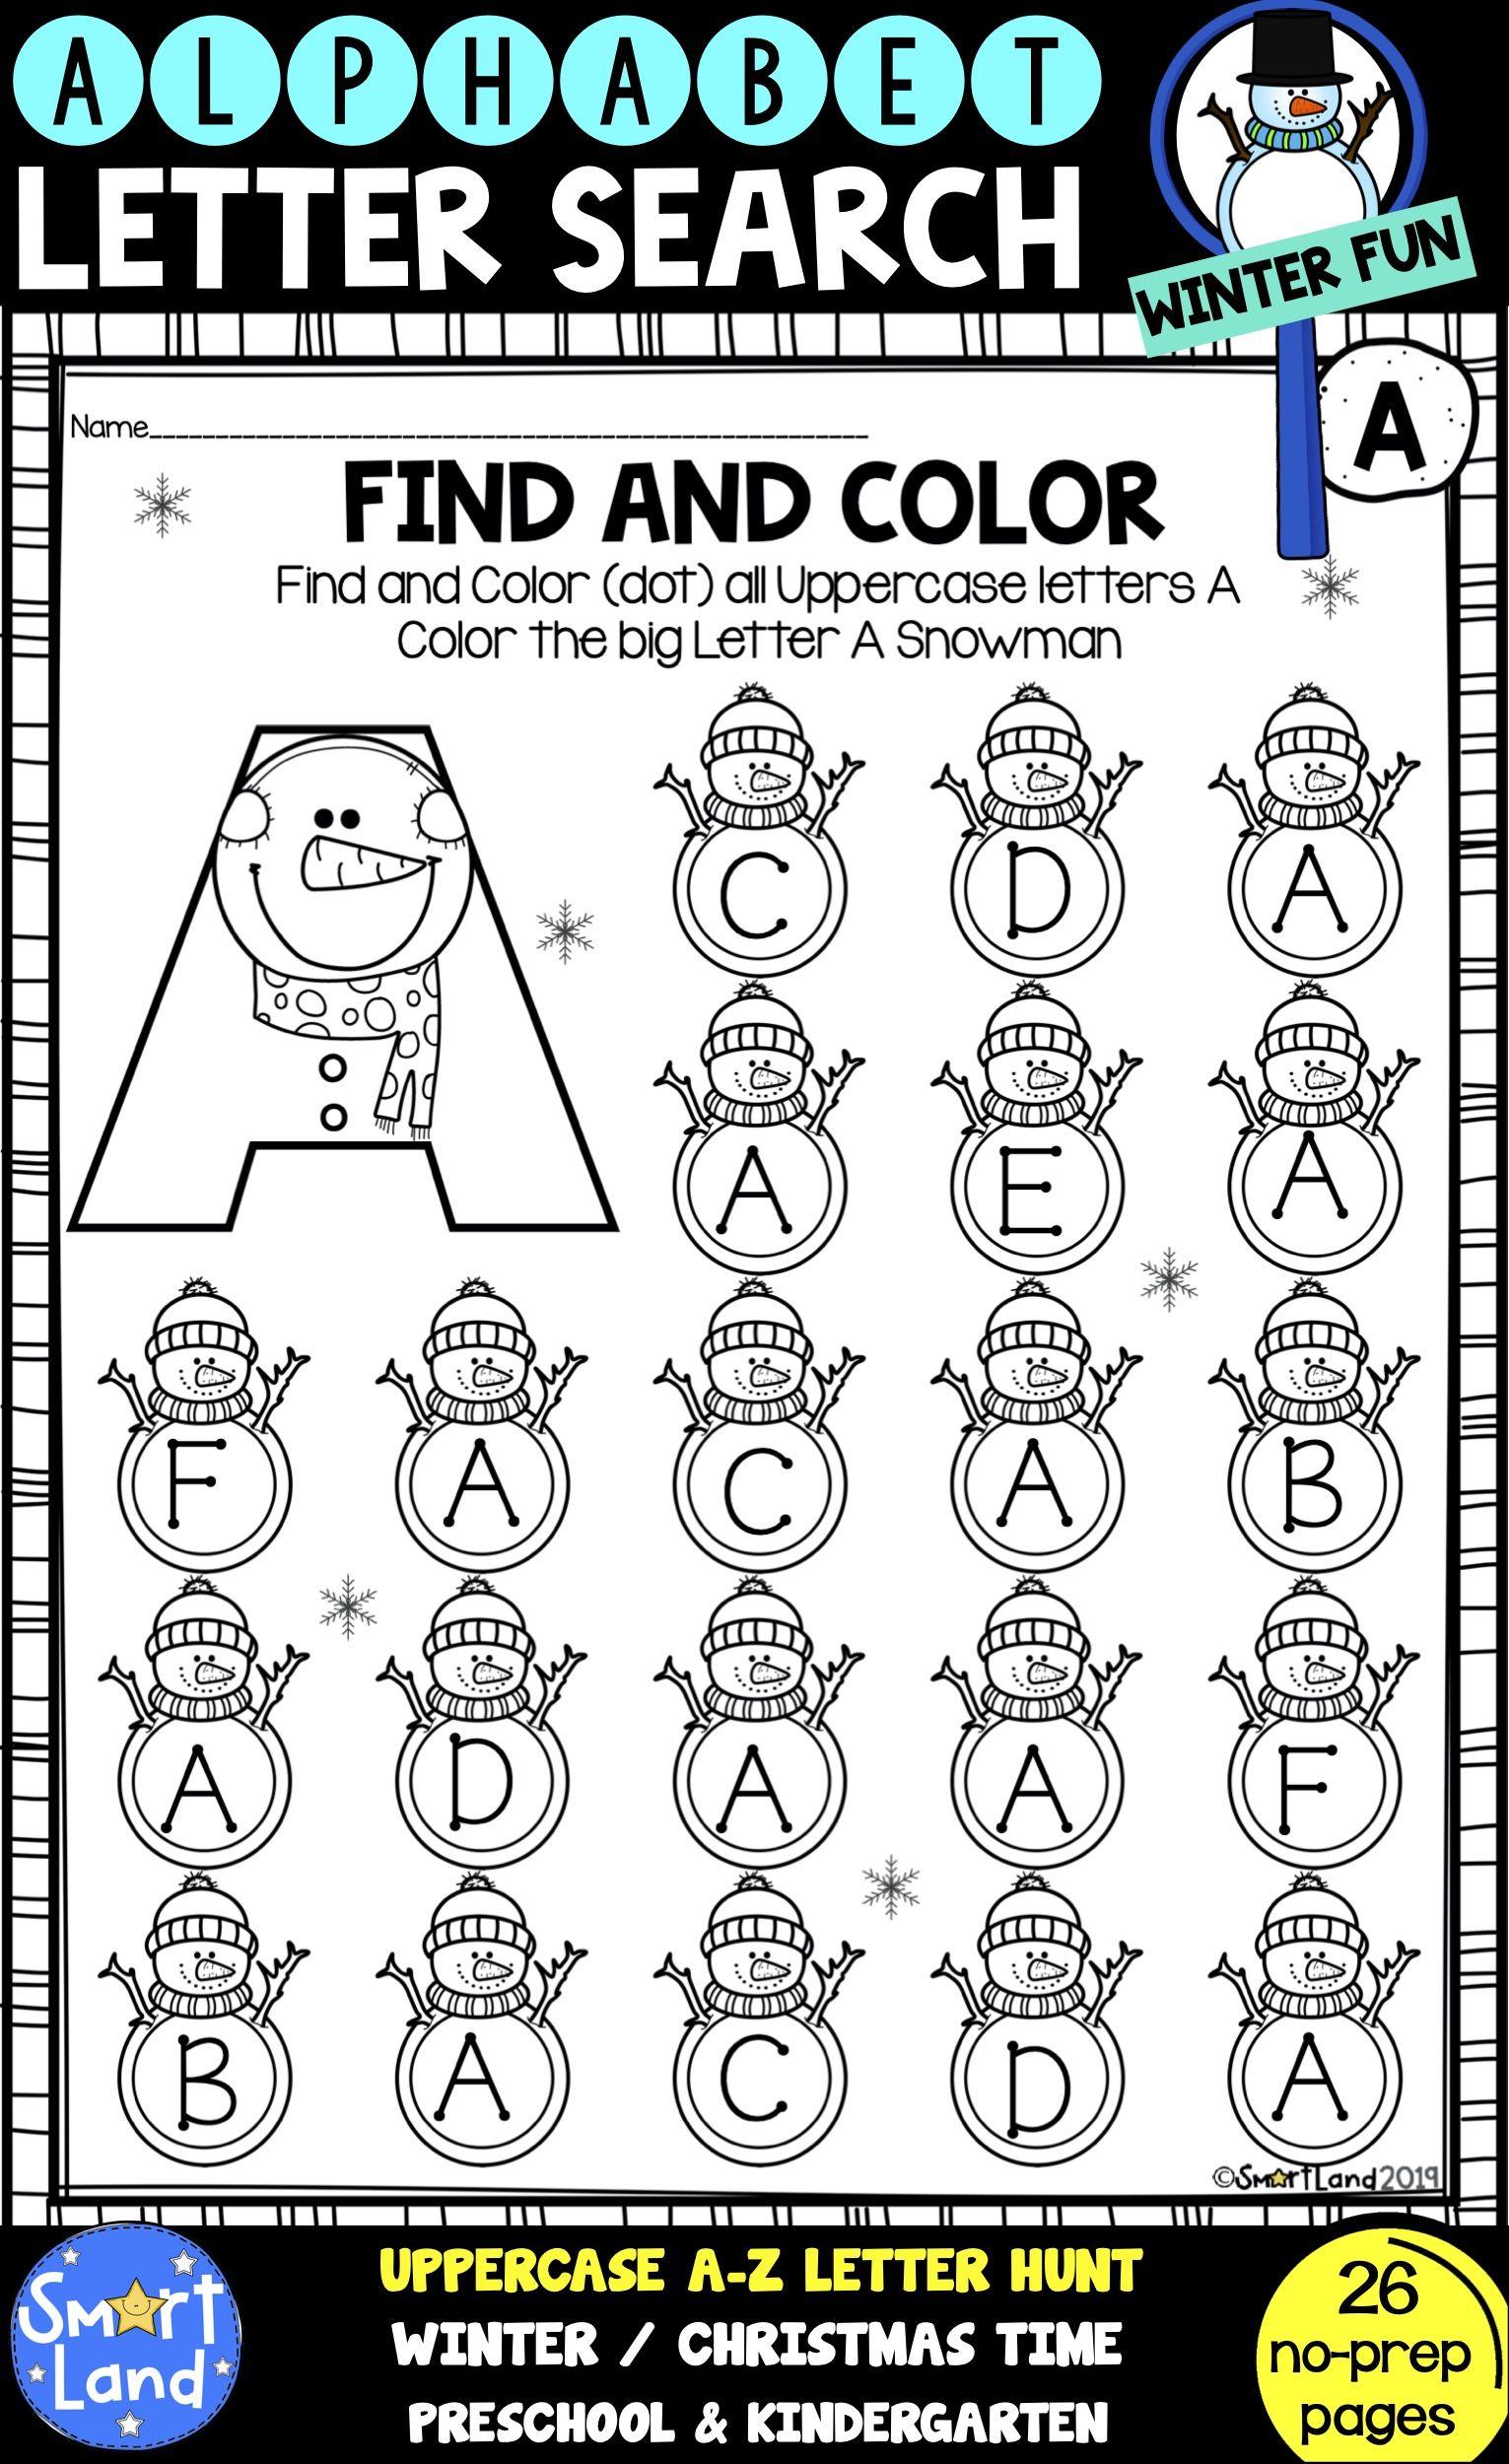 Alphabet Practice Letter Search Snowman Alphabet Practice Art Therapy Activities Letter Identification